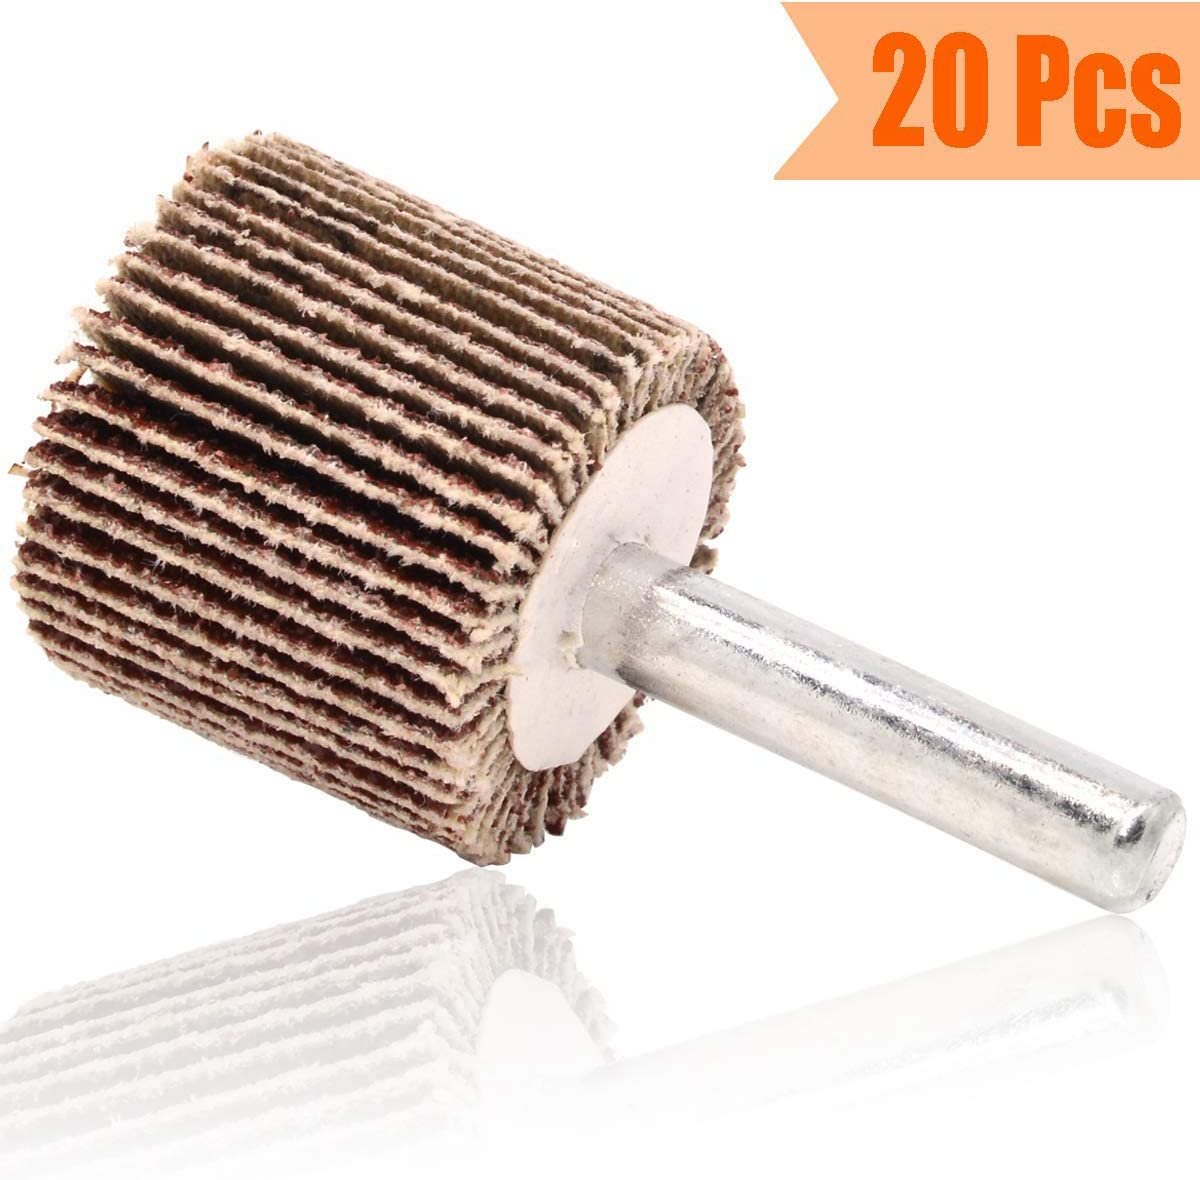 Abrasive Grinding Tool Facibom 20 Pack Mounted Flap Wheel 80 Grit Aluminum Oxide Sanding Flap Wheels for Drill